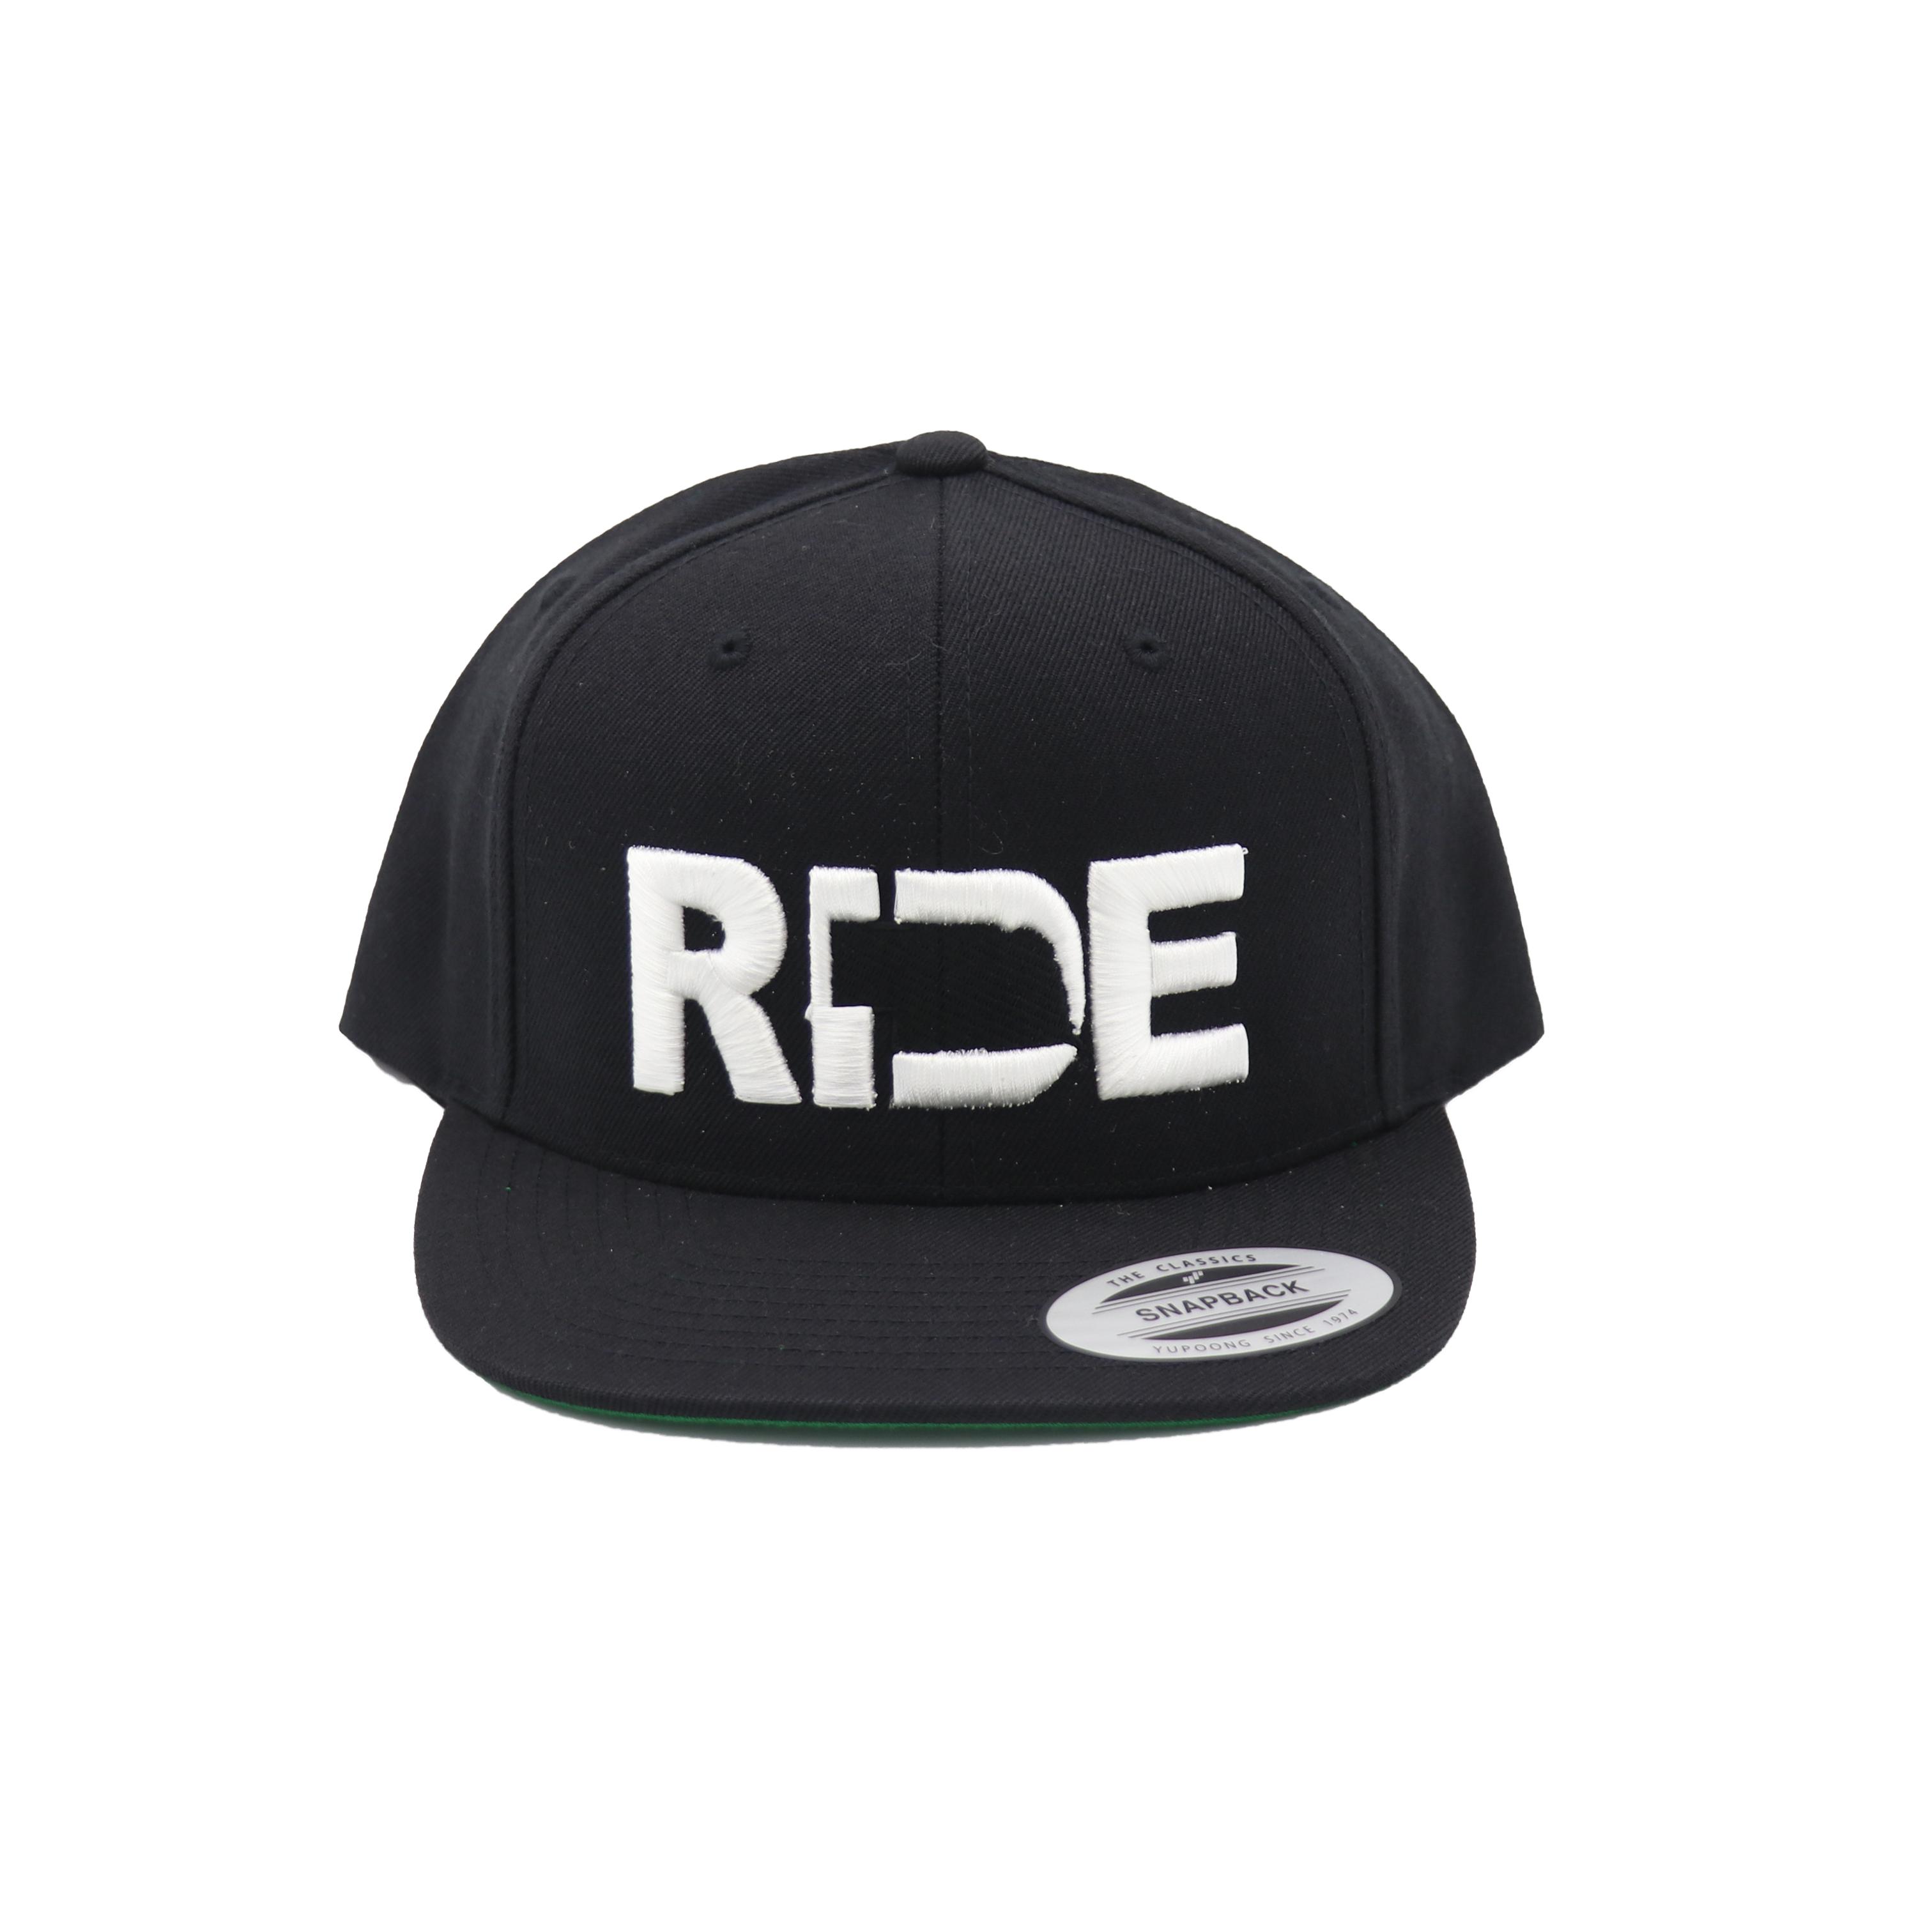 Ride Nebraska Classic Embroidered  Snapback Flat Brim Hat Black/White